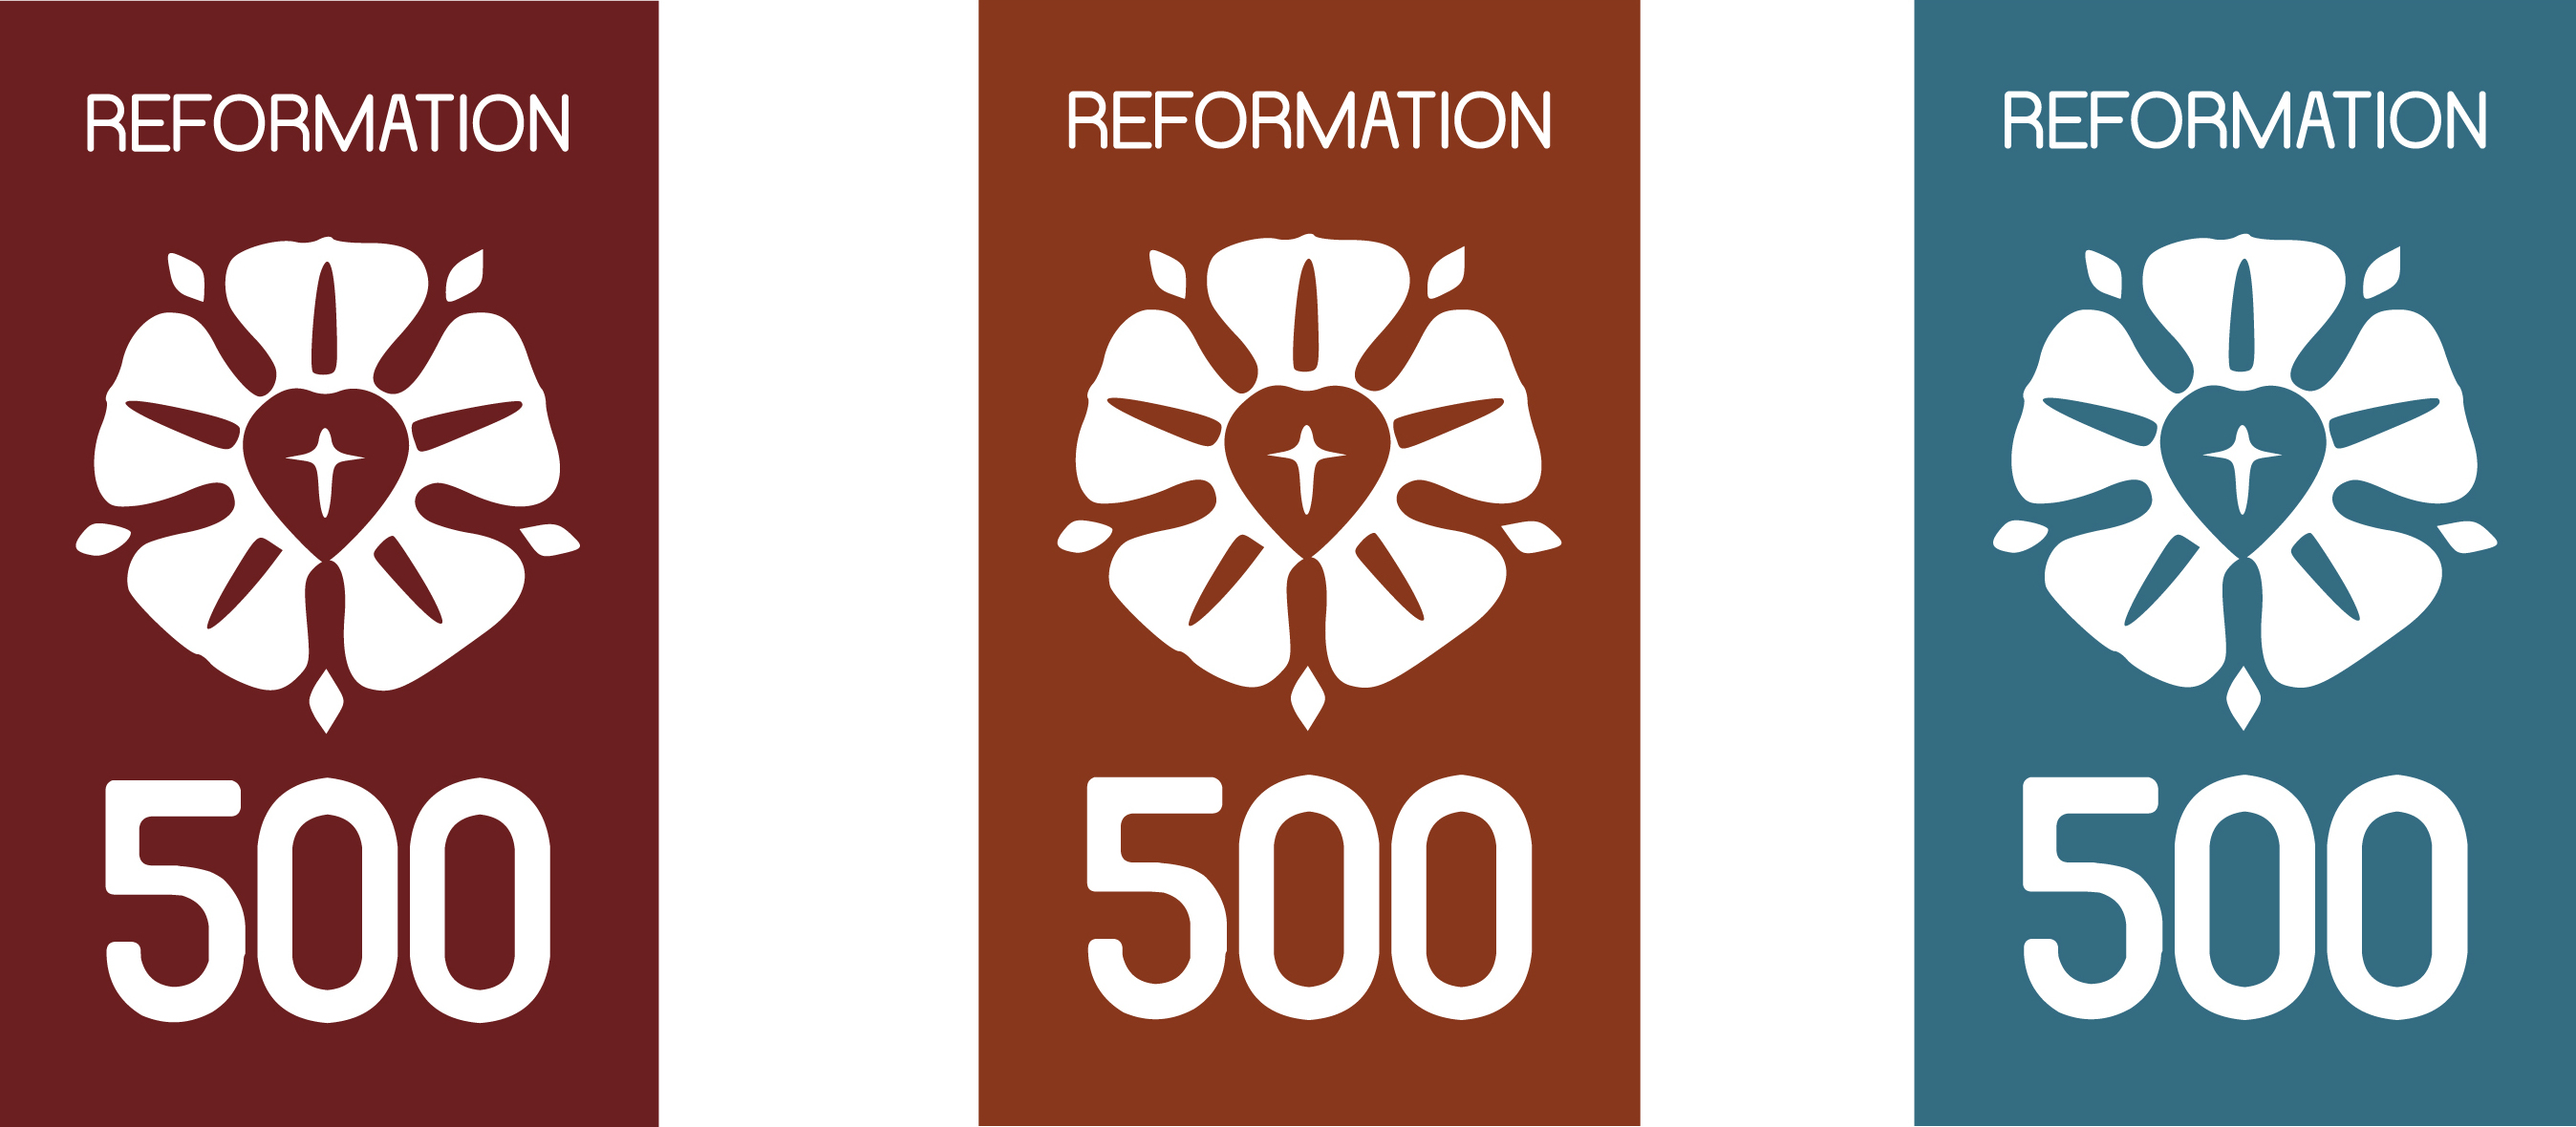 New Reformation500 Website